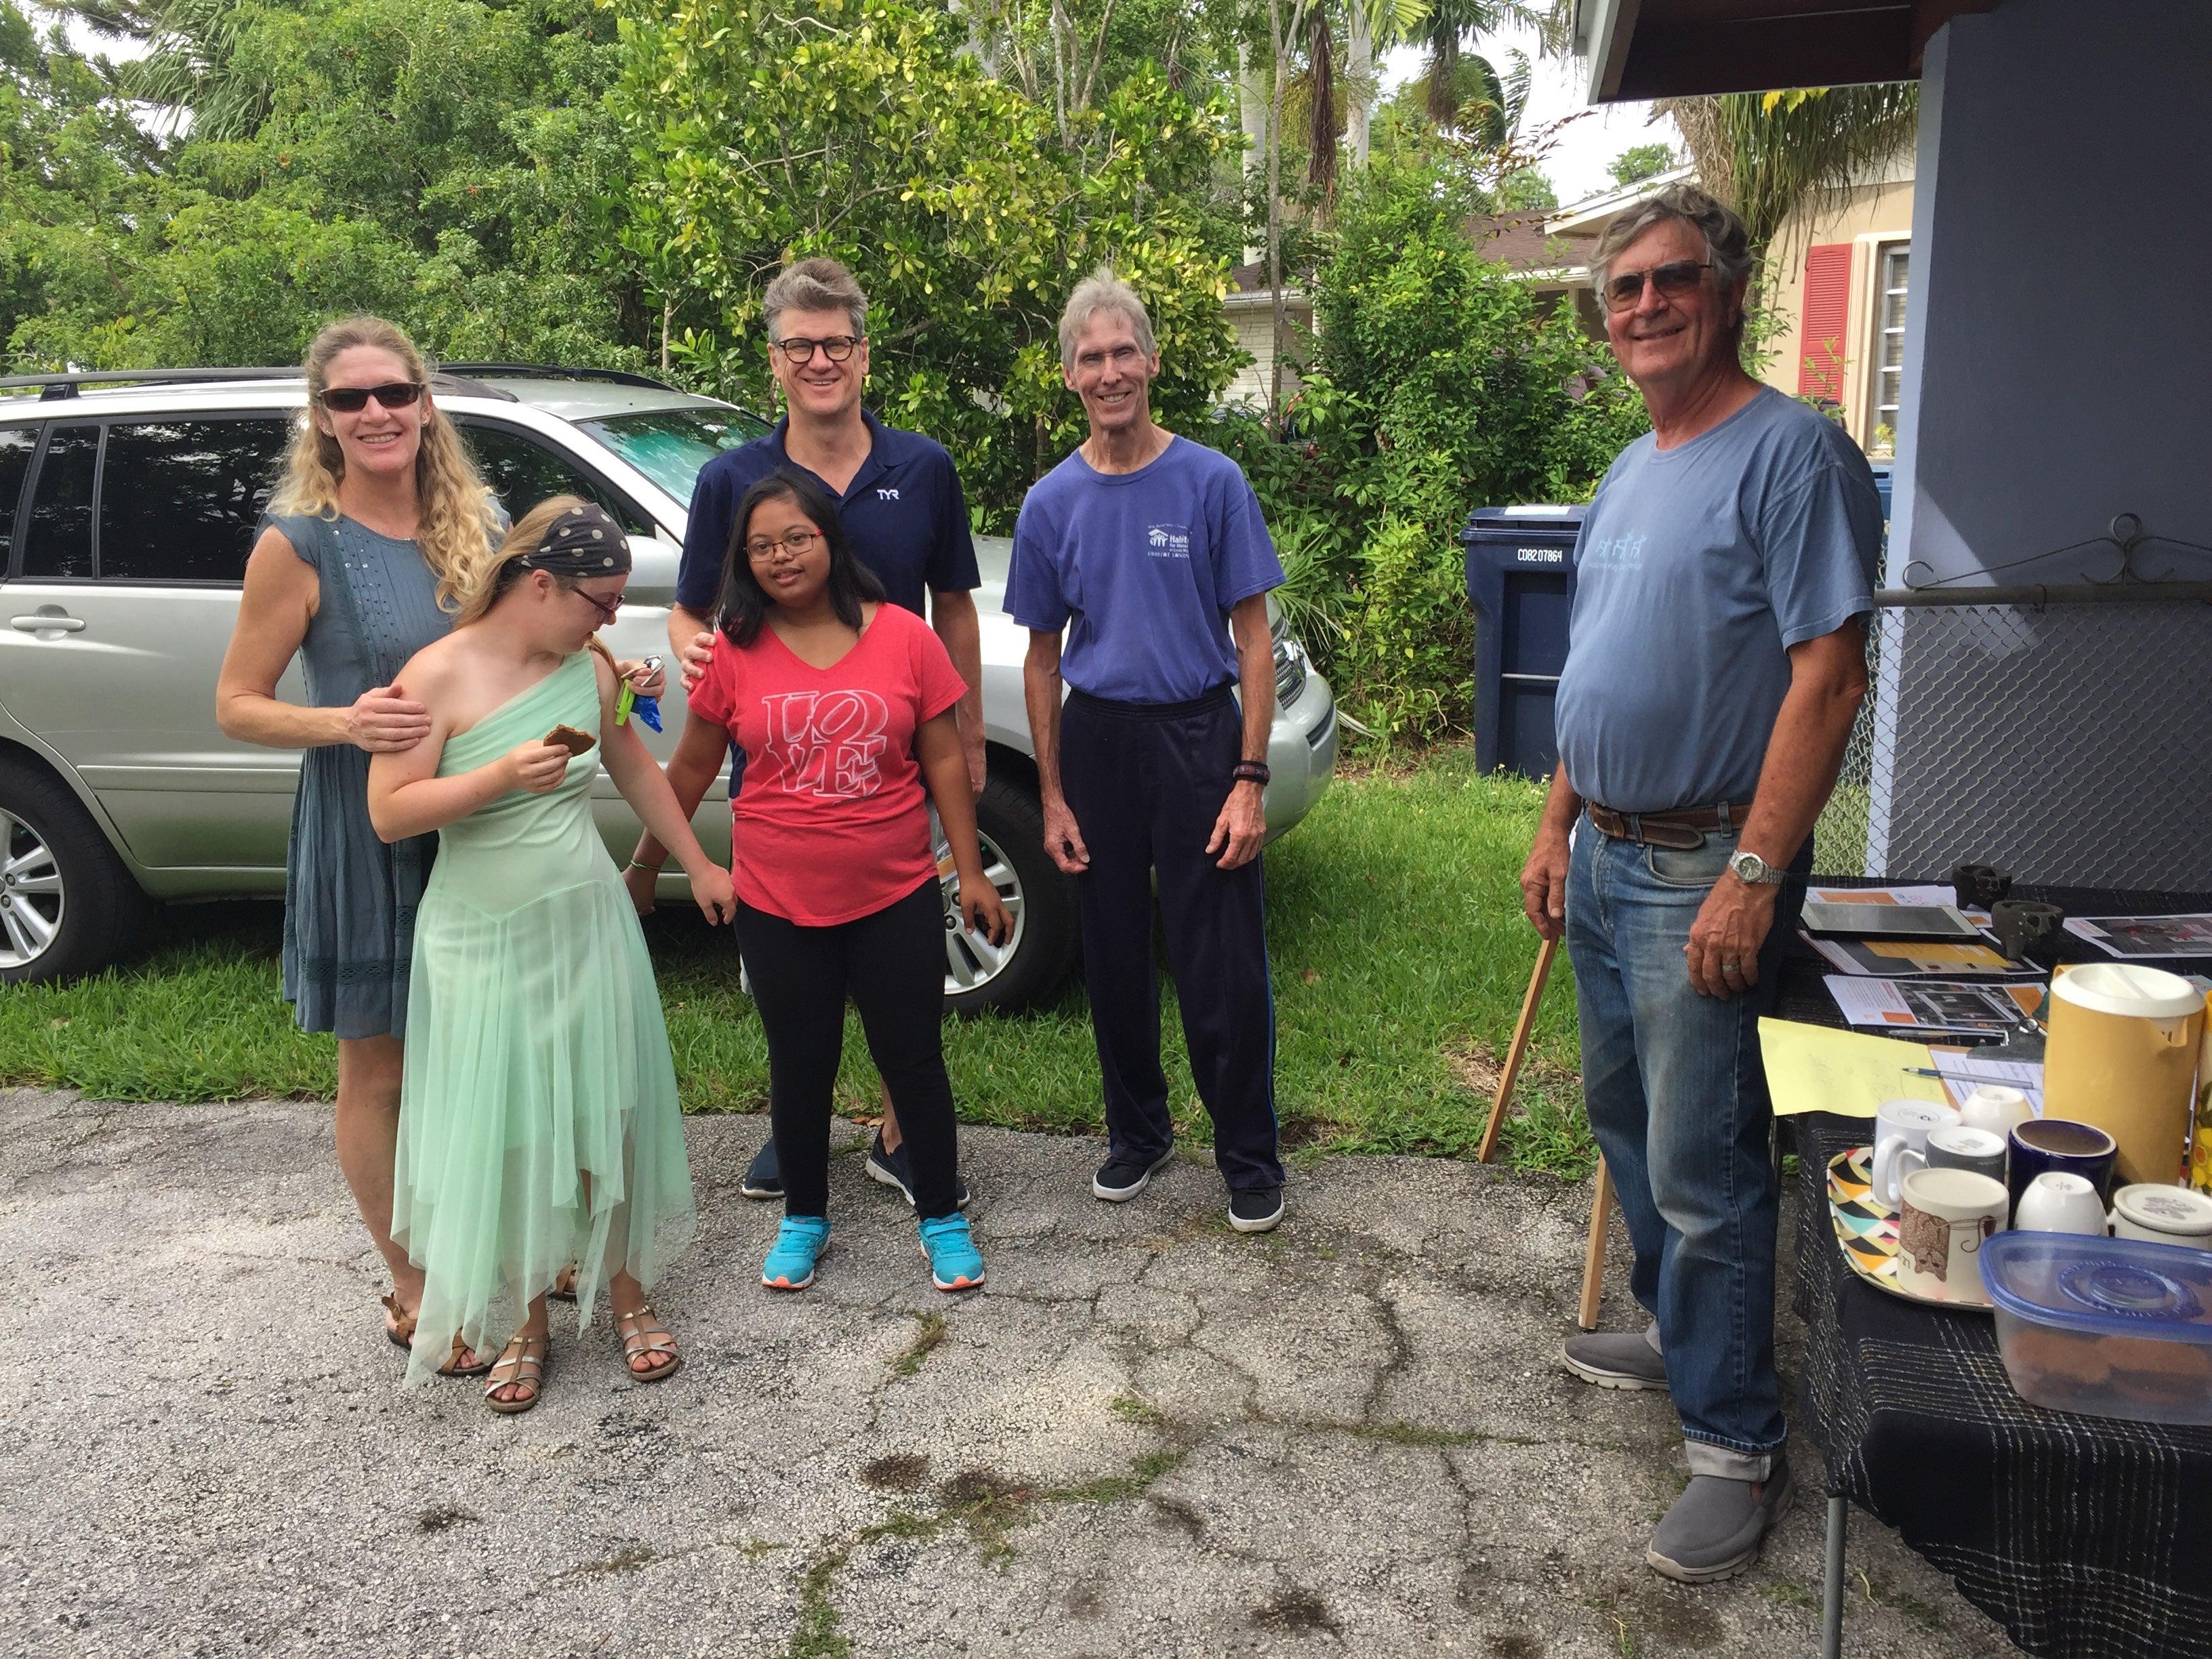 John Palenchar — South Miami, Florida